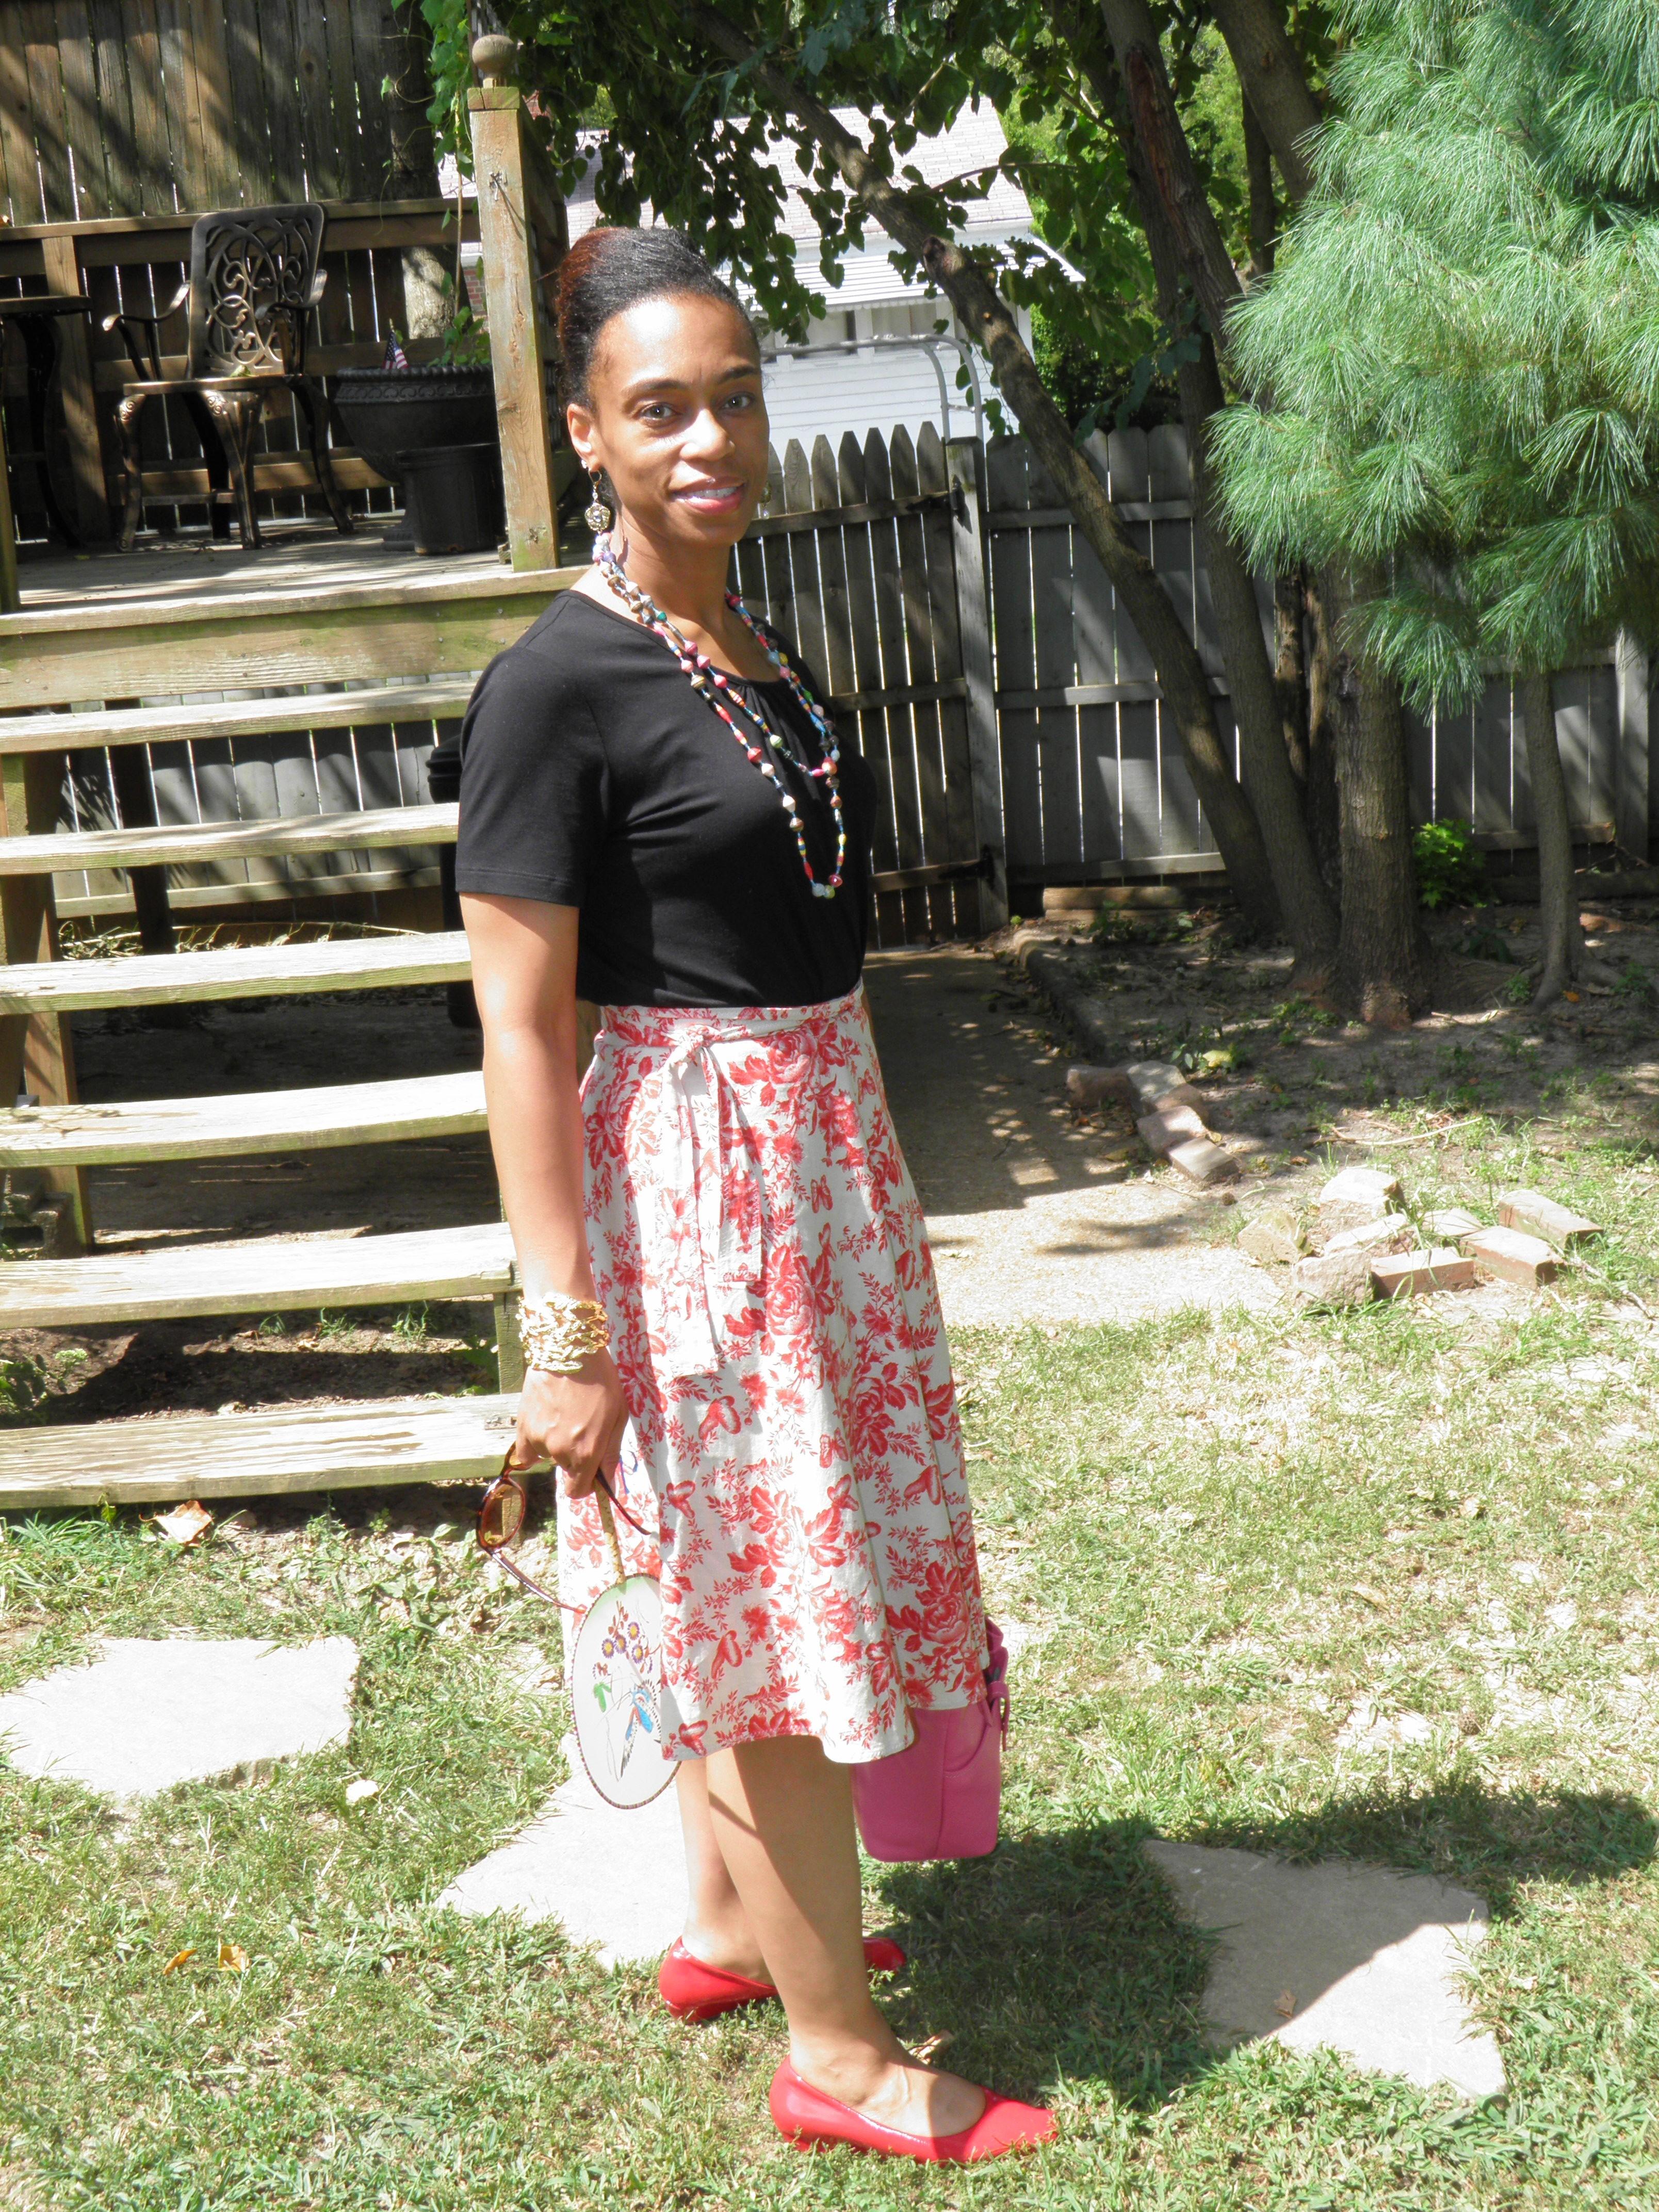 Tina Knowles Dresses At Walmart  P E